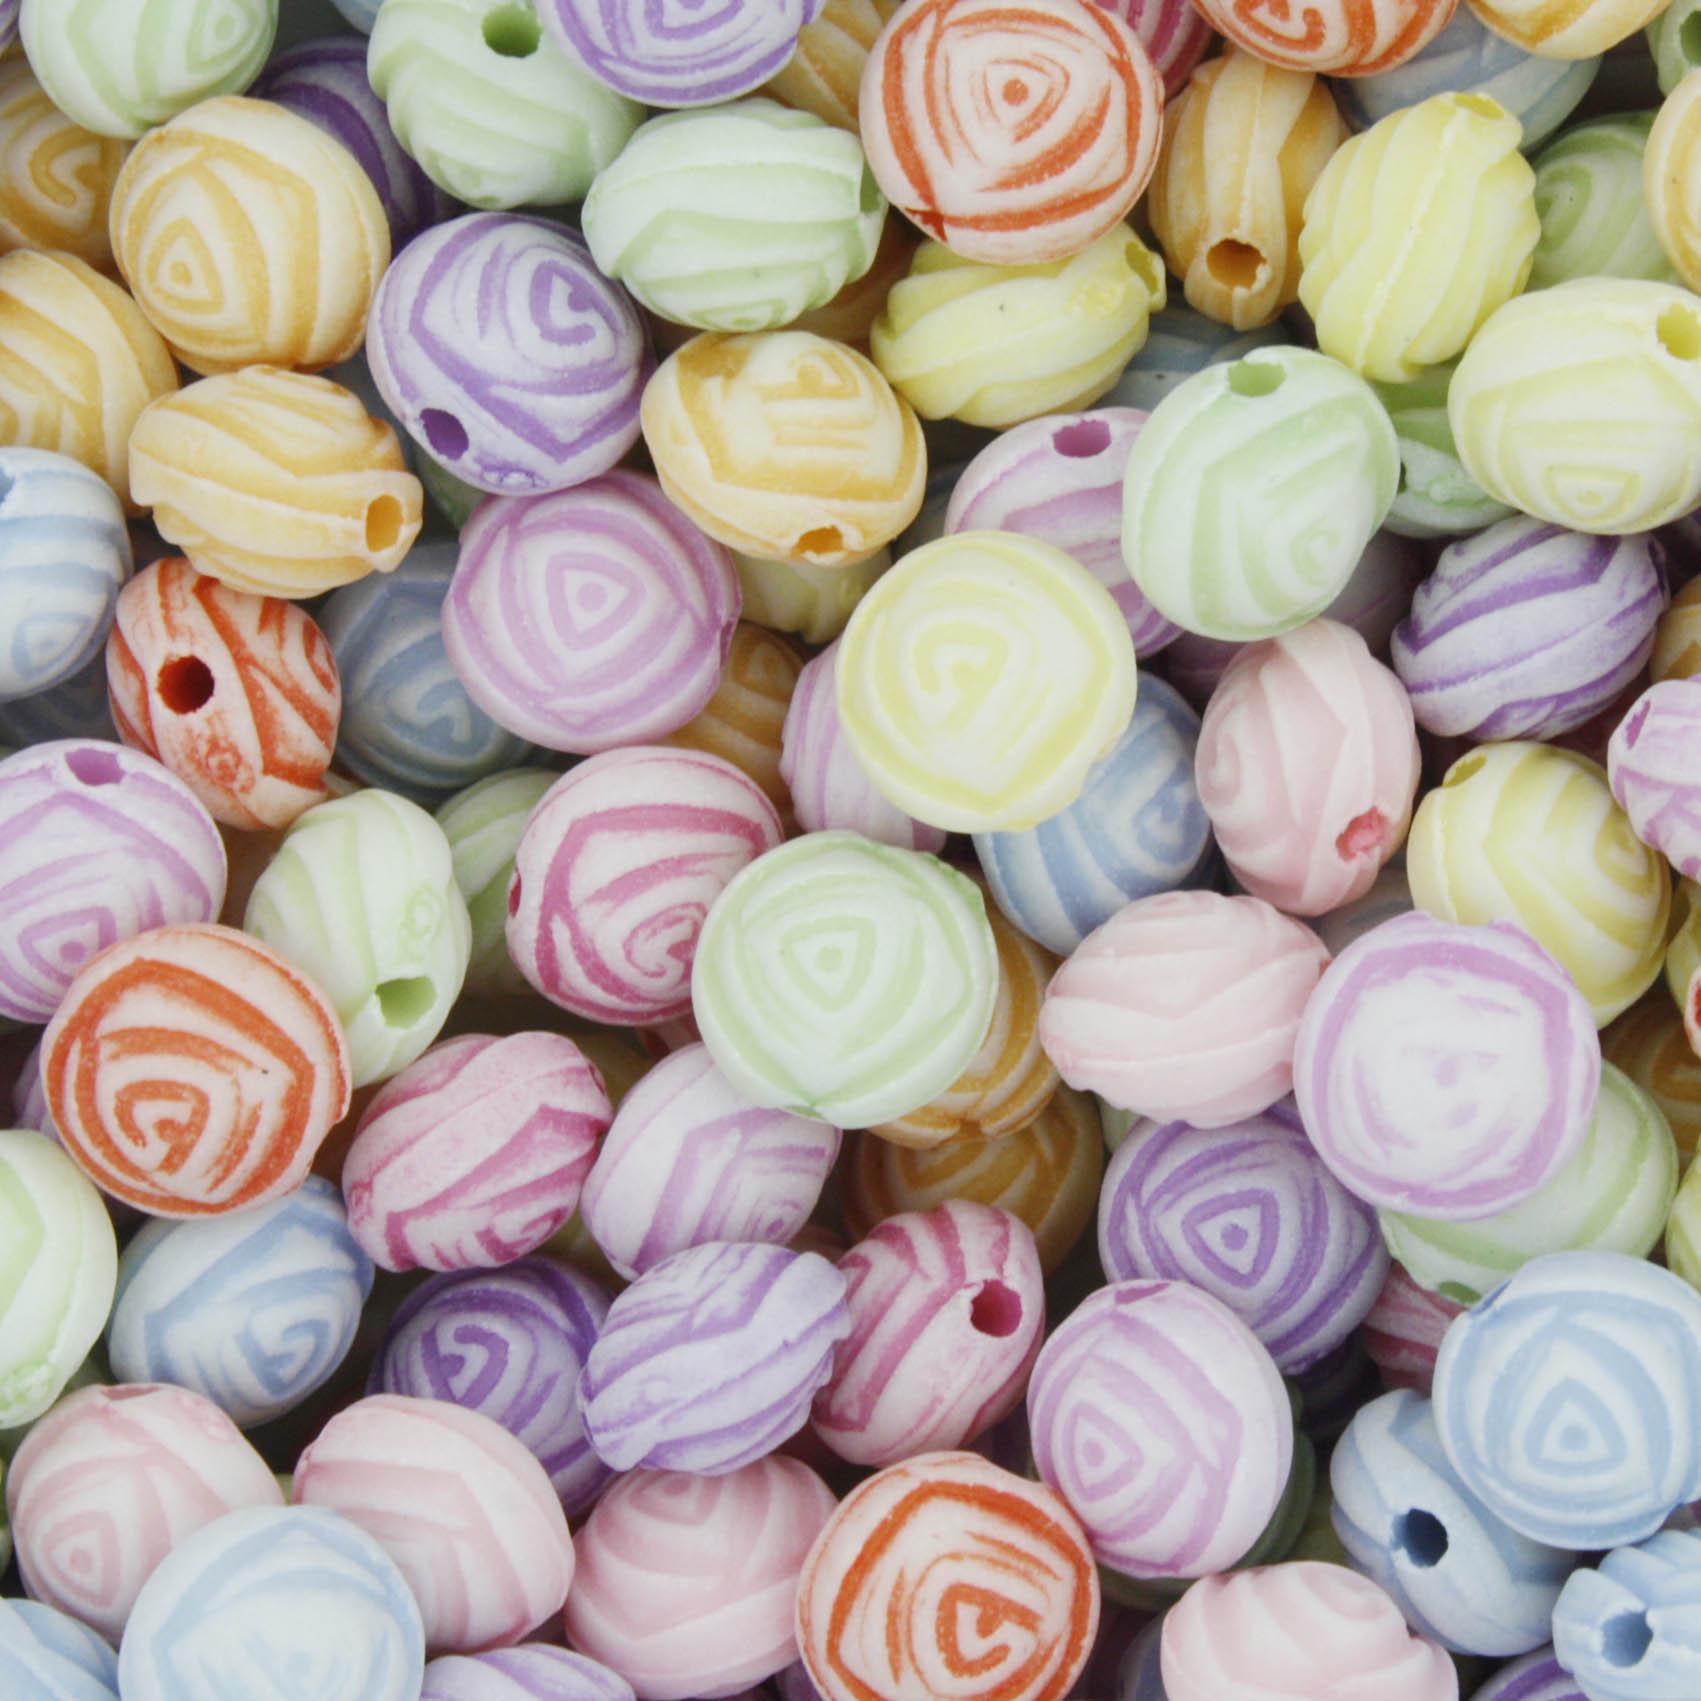 Miçanga Colorida / Infantil - Rosa  - Stéphanie Bijoux® - Peças para Bijuterias e Artesanato